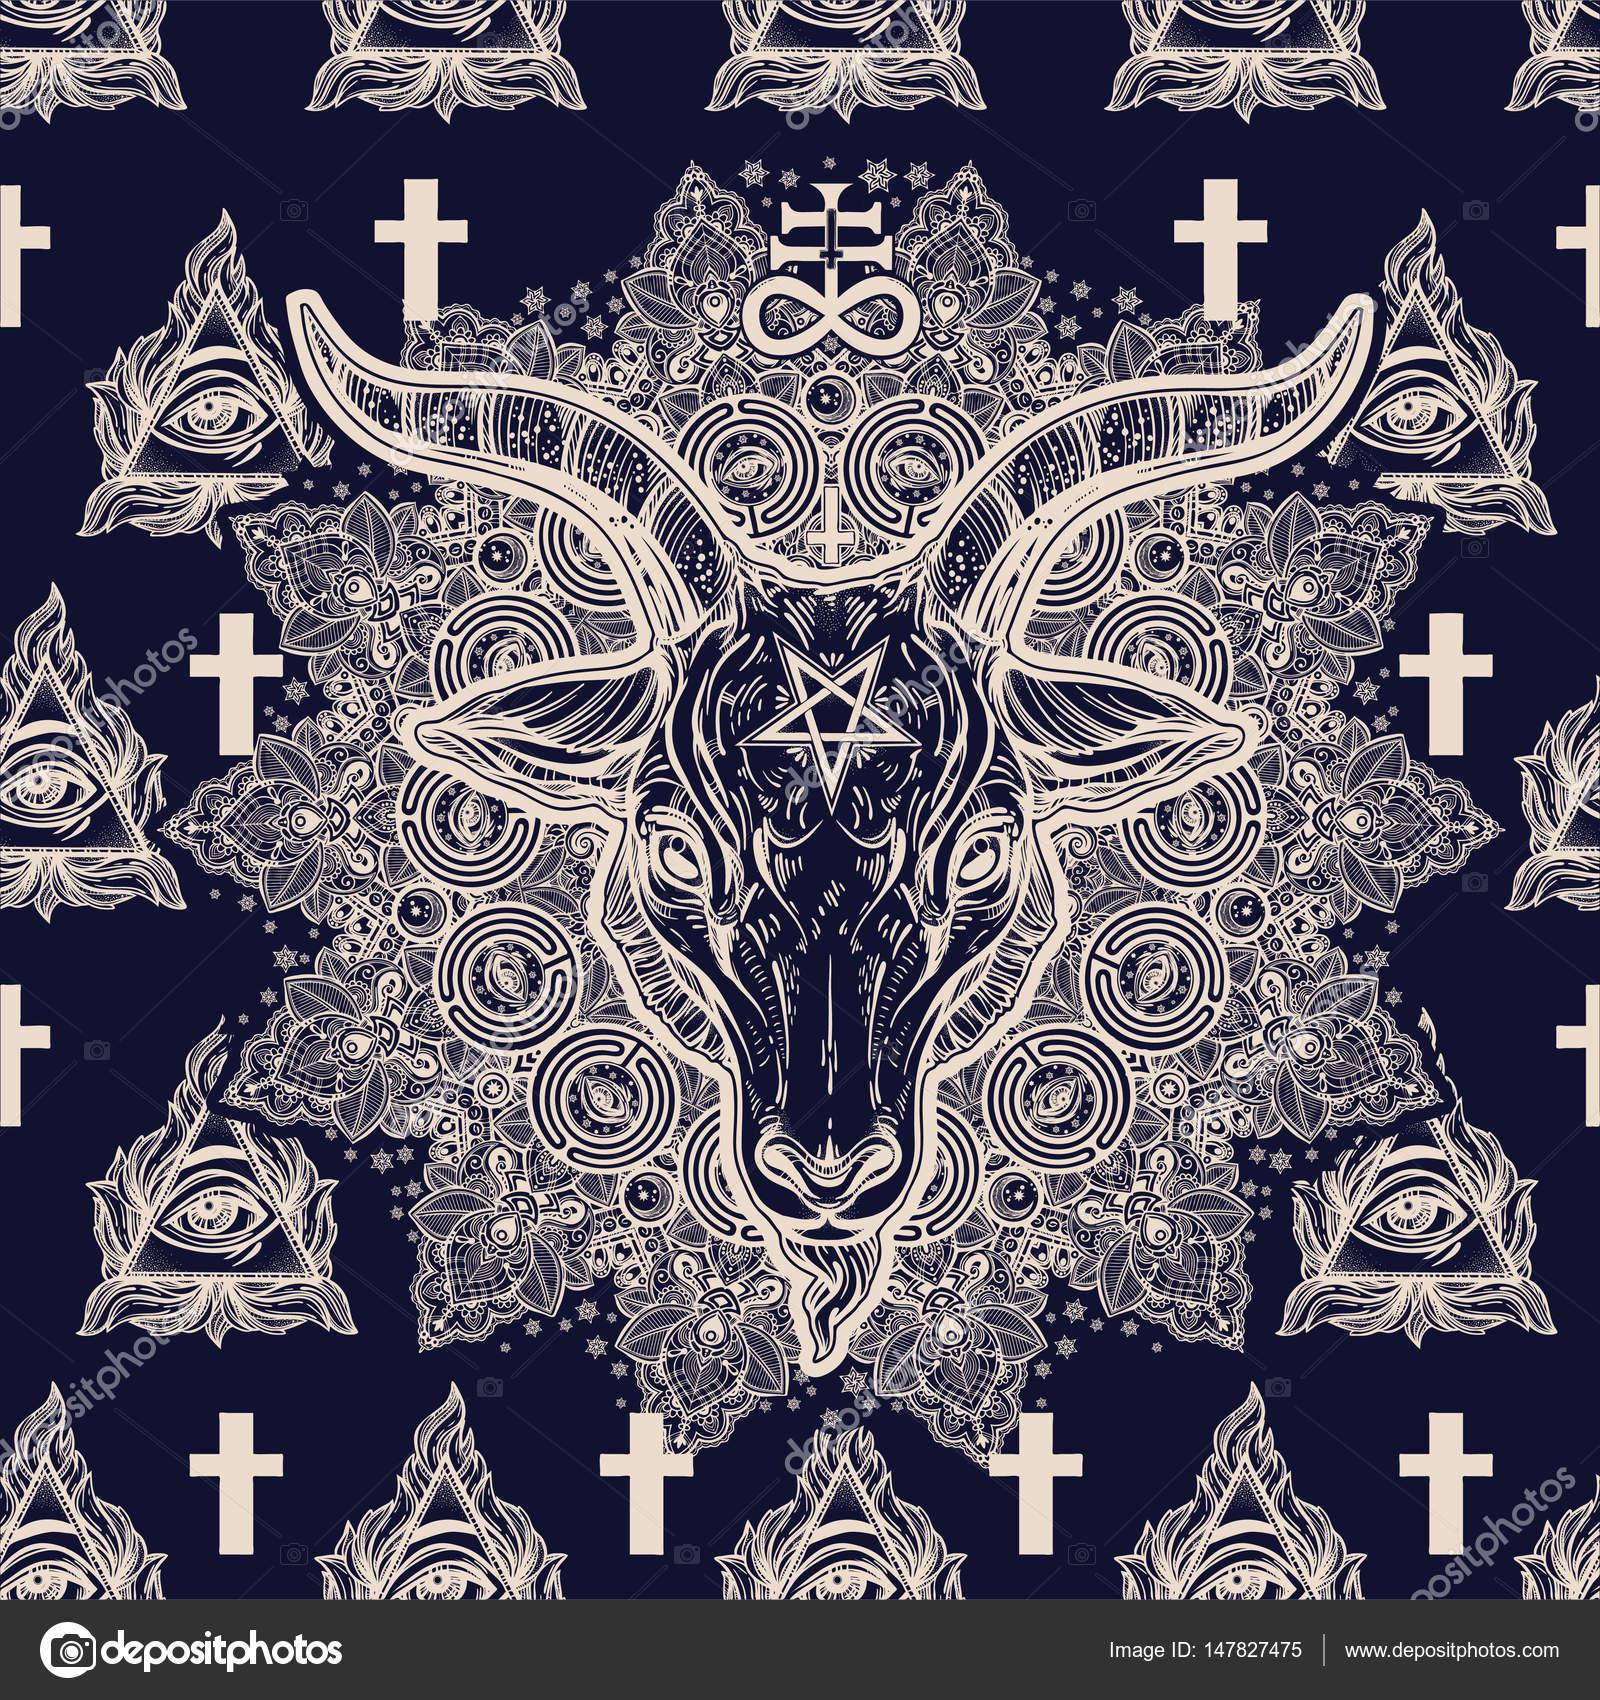 Eye cross mandala seamless pattern with satan stock vector satanic eye pyramidal symbol and cross ornate round mandala seamless pattern with demon baphomet pagan goat head isolated repetition background biocorpaavc